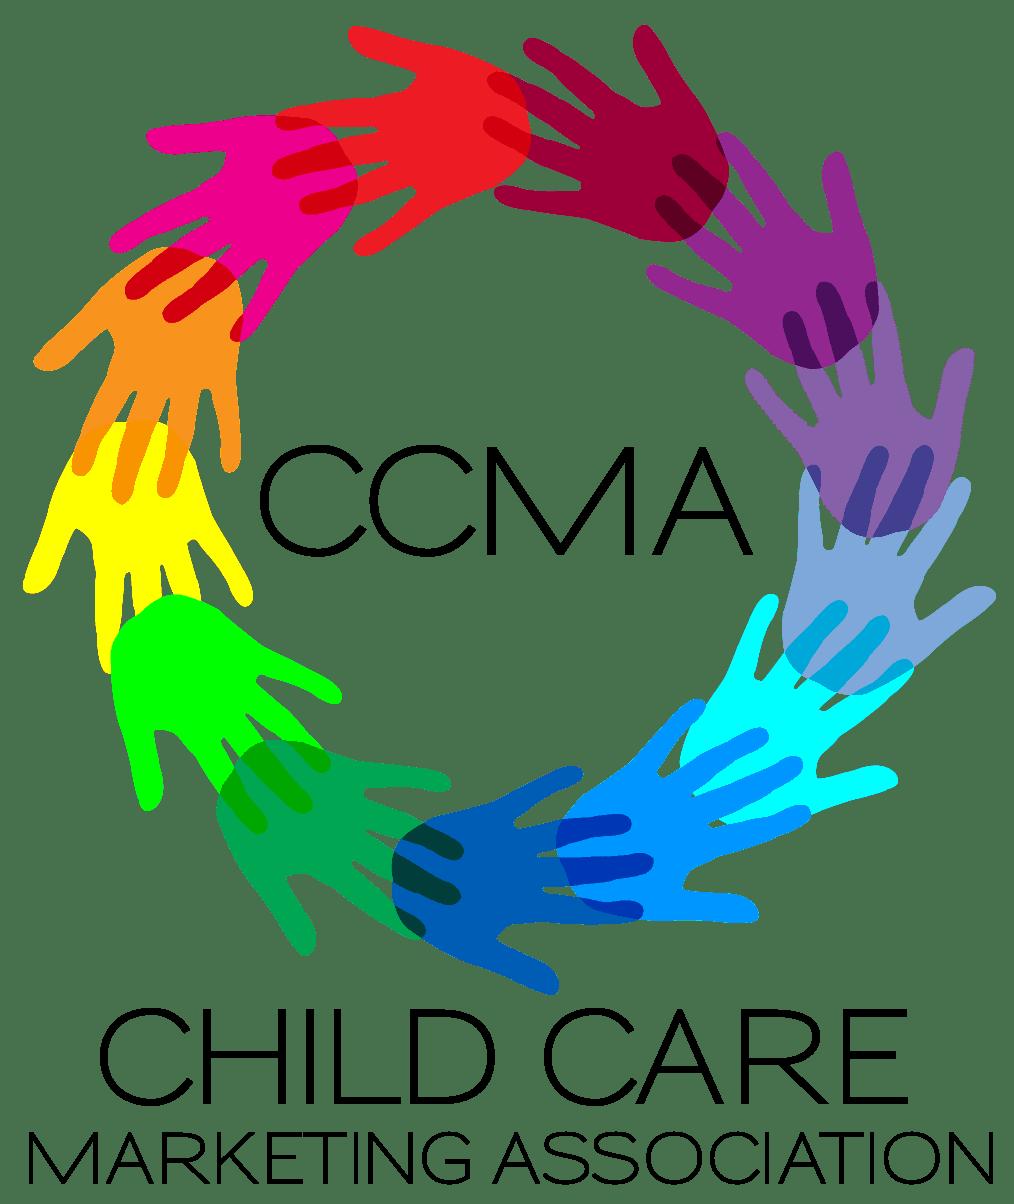 Child Care Marketing Assocation